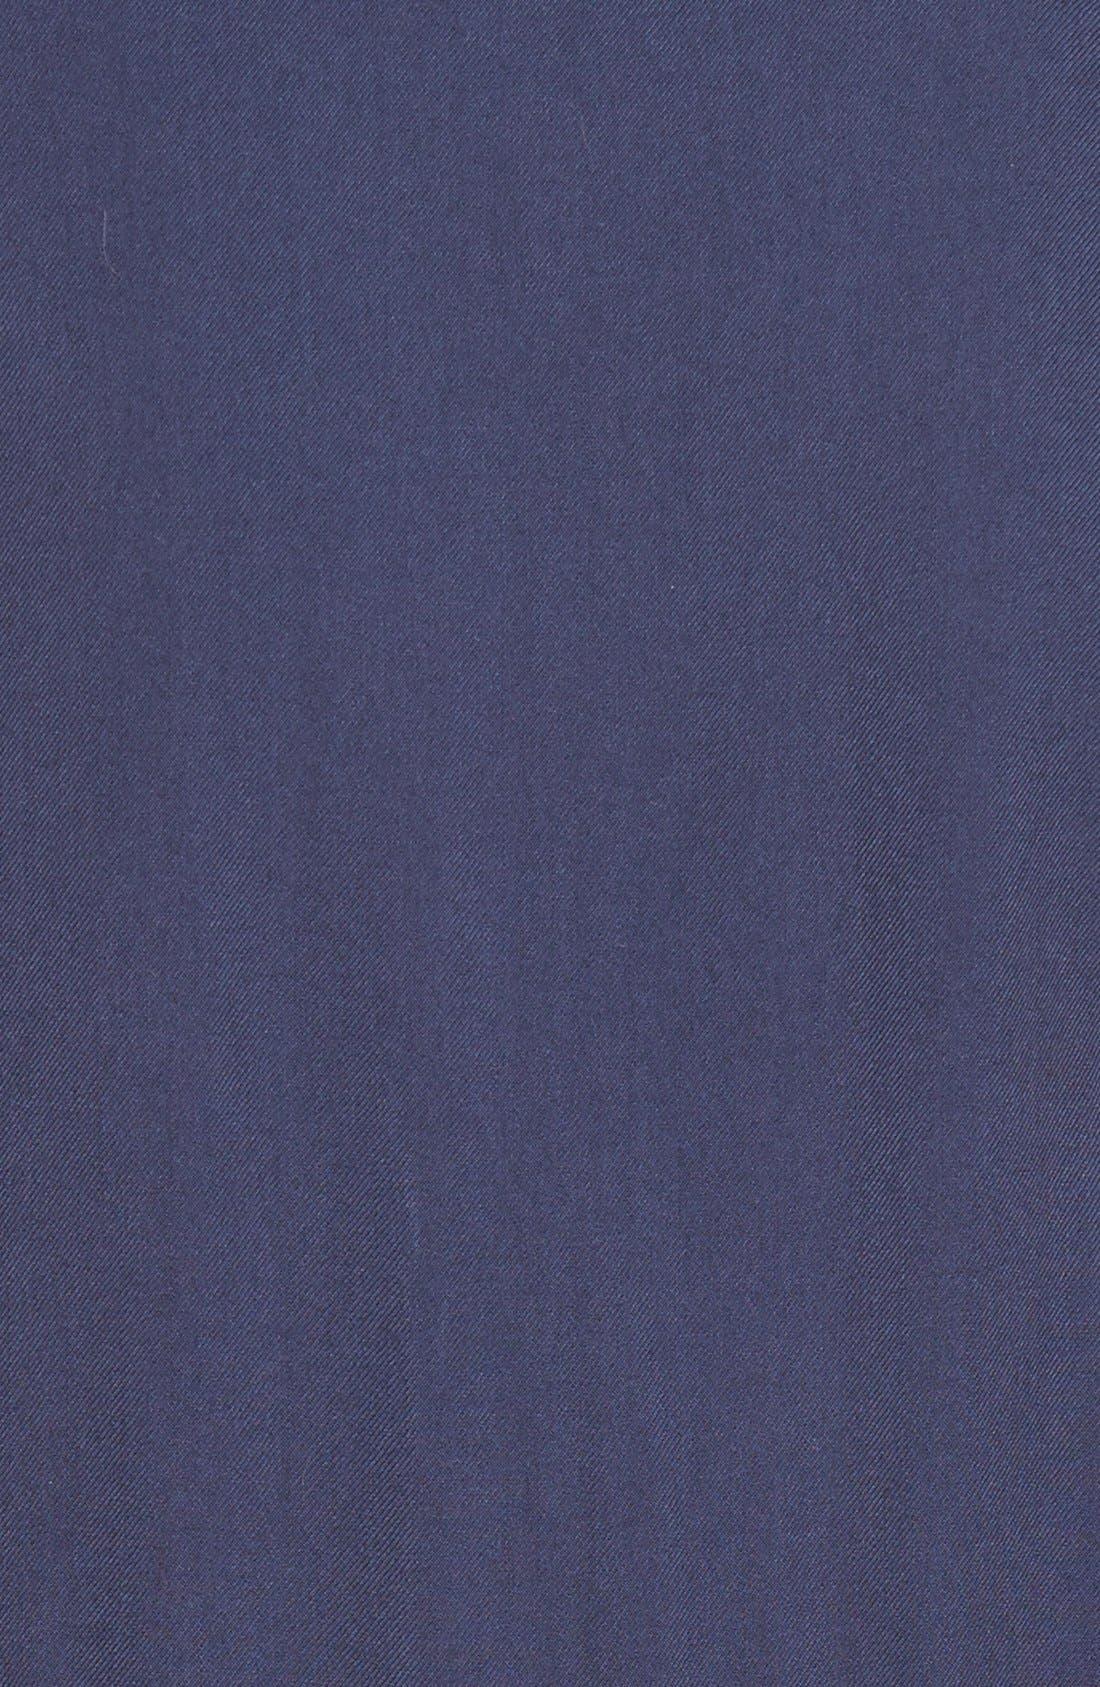 CUPCAKES AND CASHMERE,                             'Roxbury' Jumpsuit,                             Alternate thumbnail 3, color,                             410